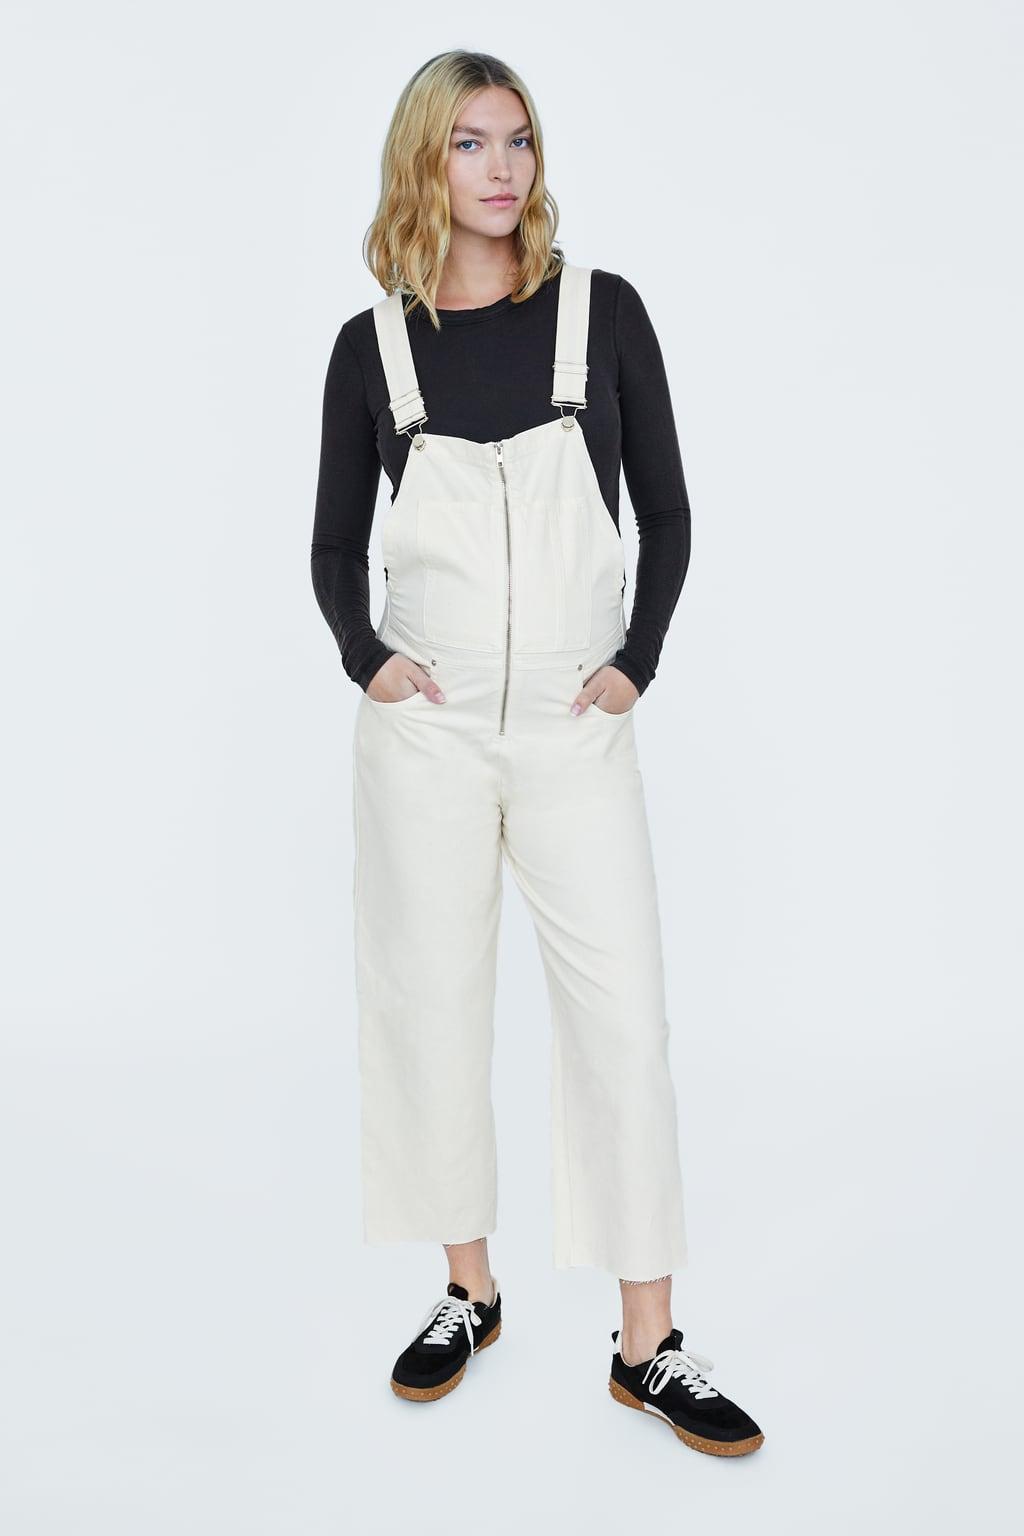 Zara maternity wear